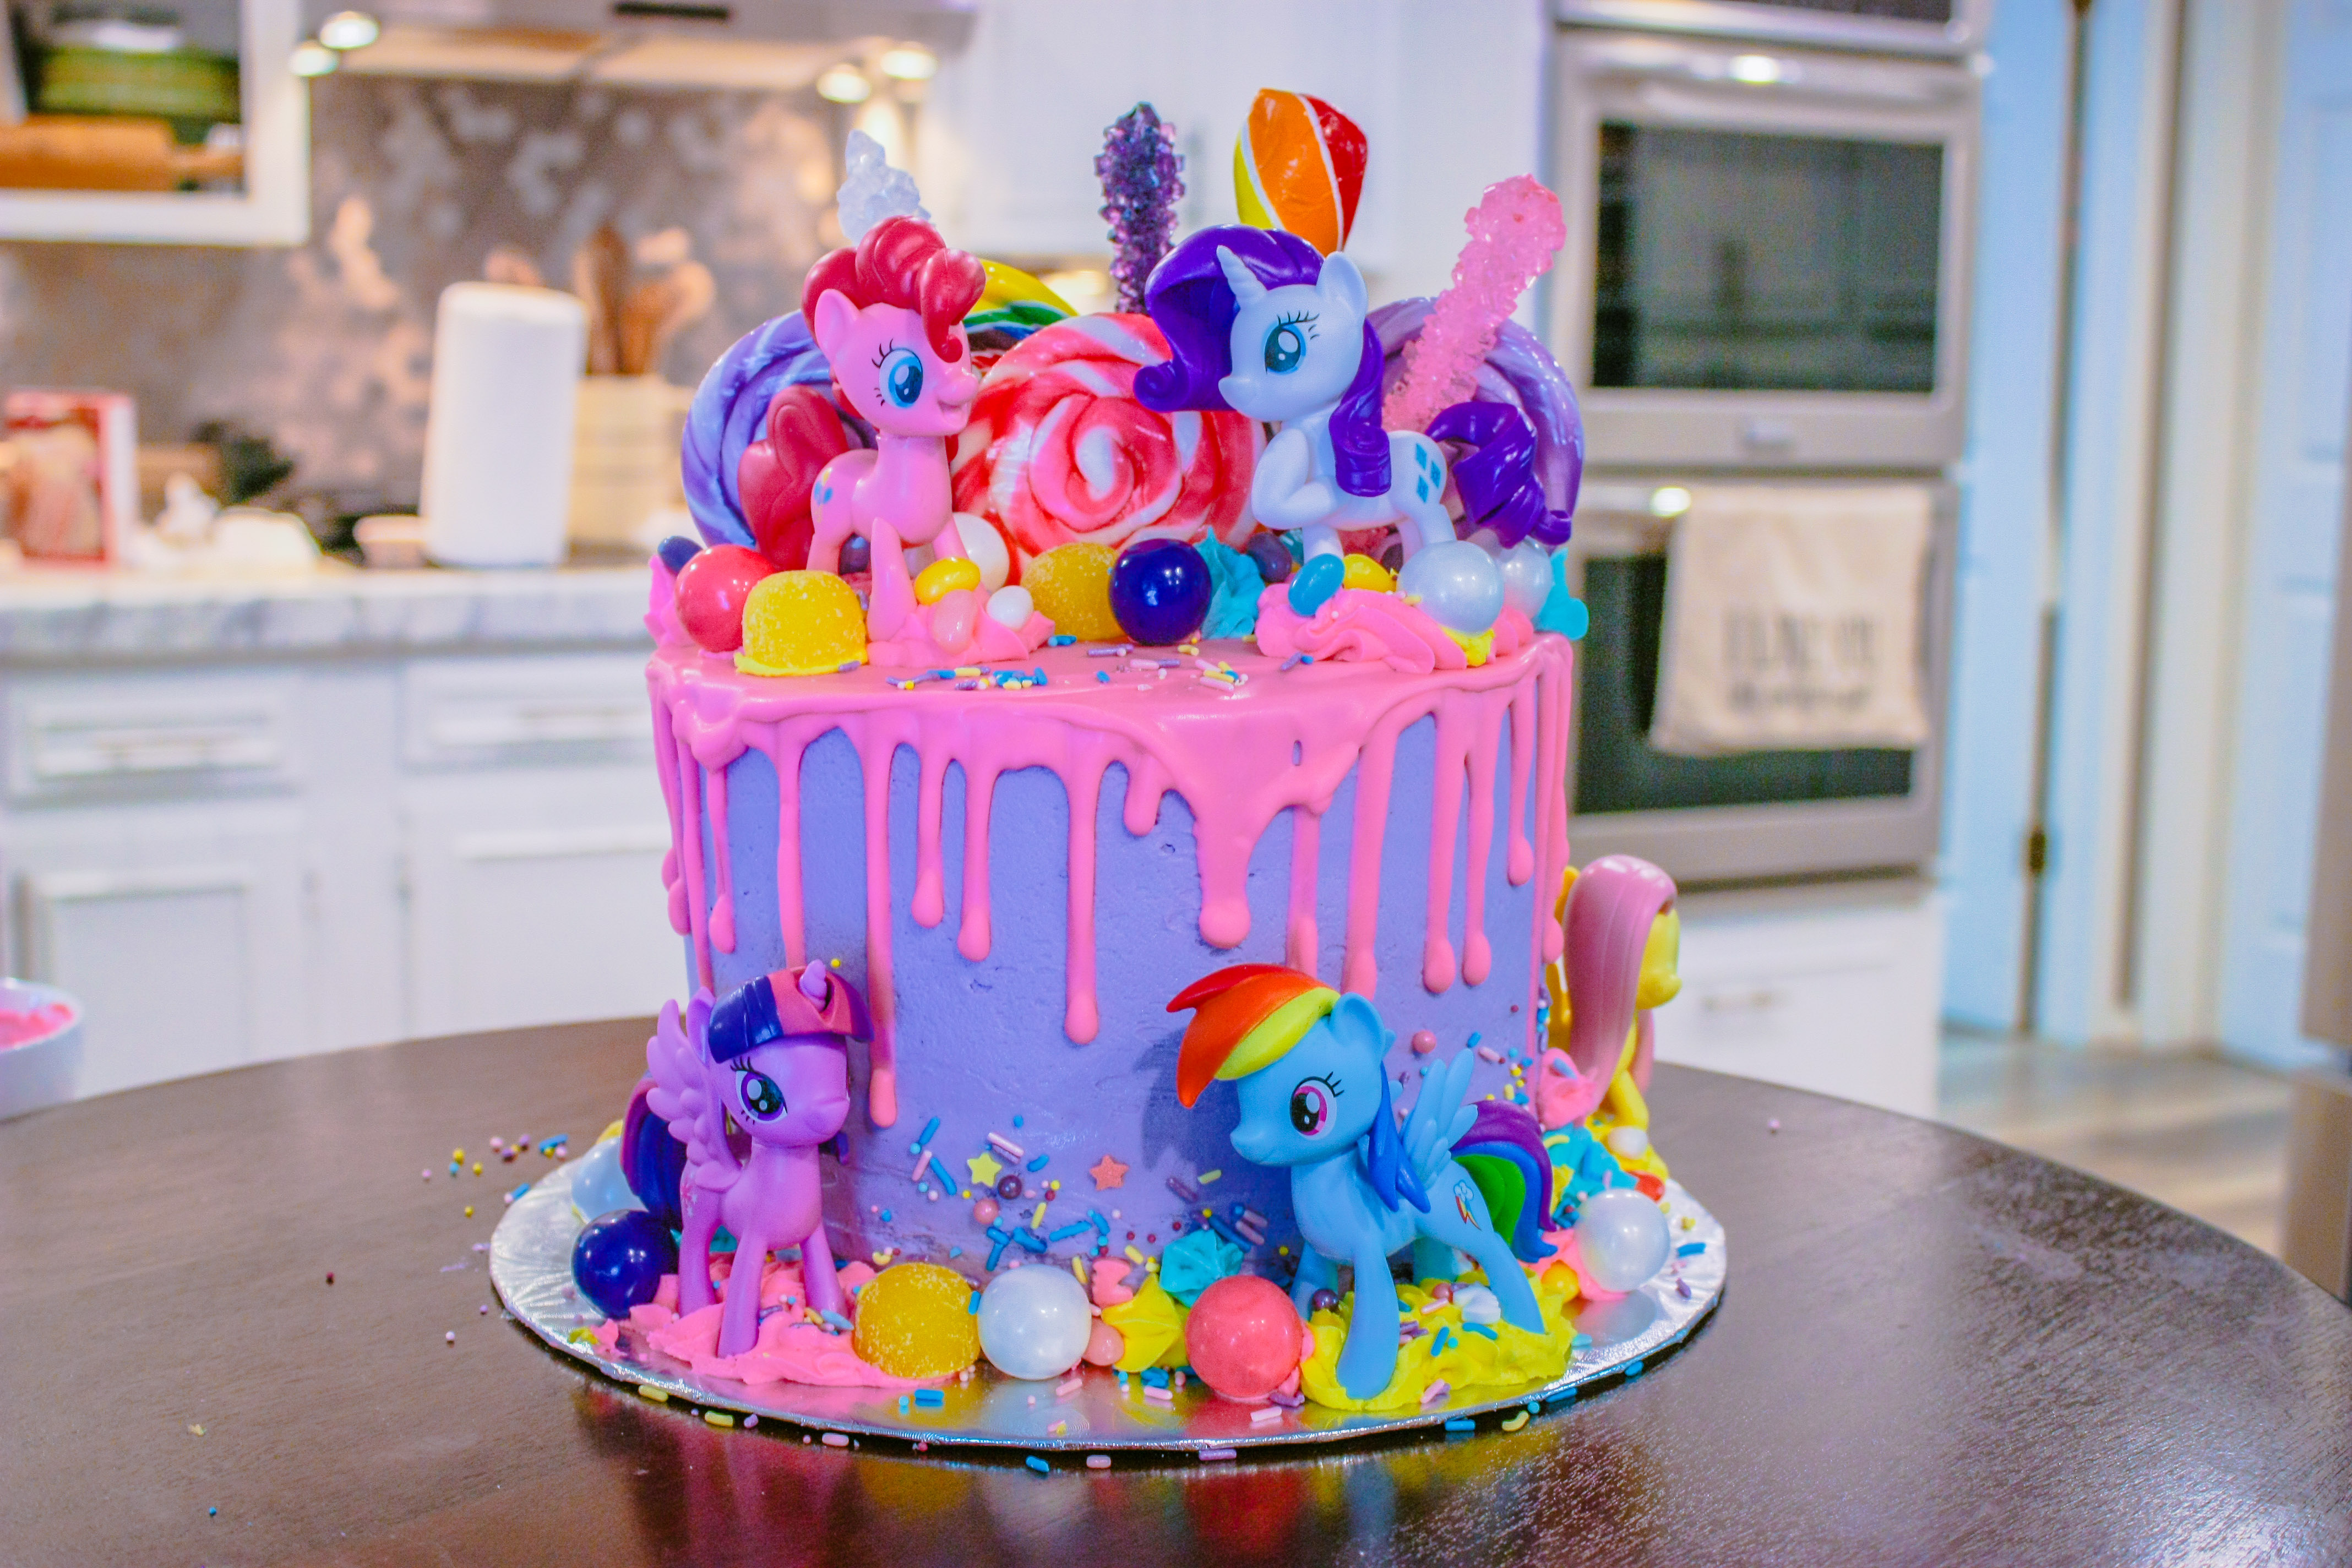 Pleasing My Little Pony Cake Jennifer Cooks Funny Birthday Cards Online Alyptdamsfinfo